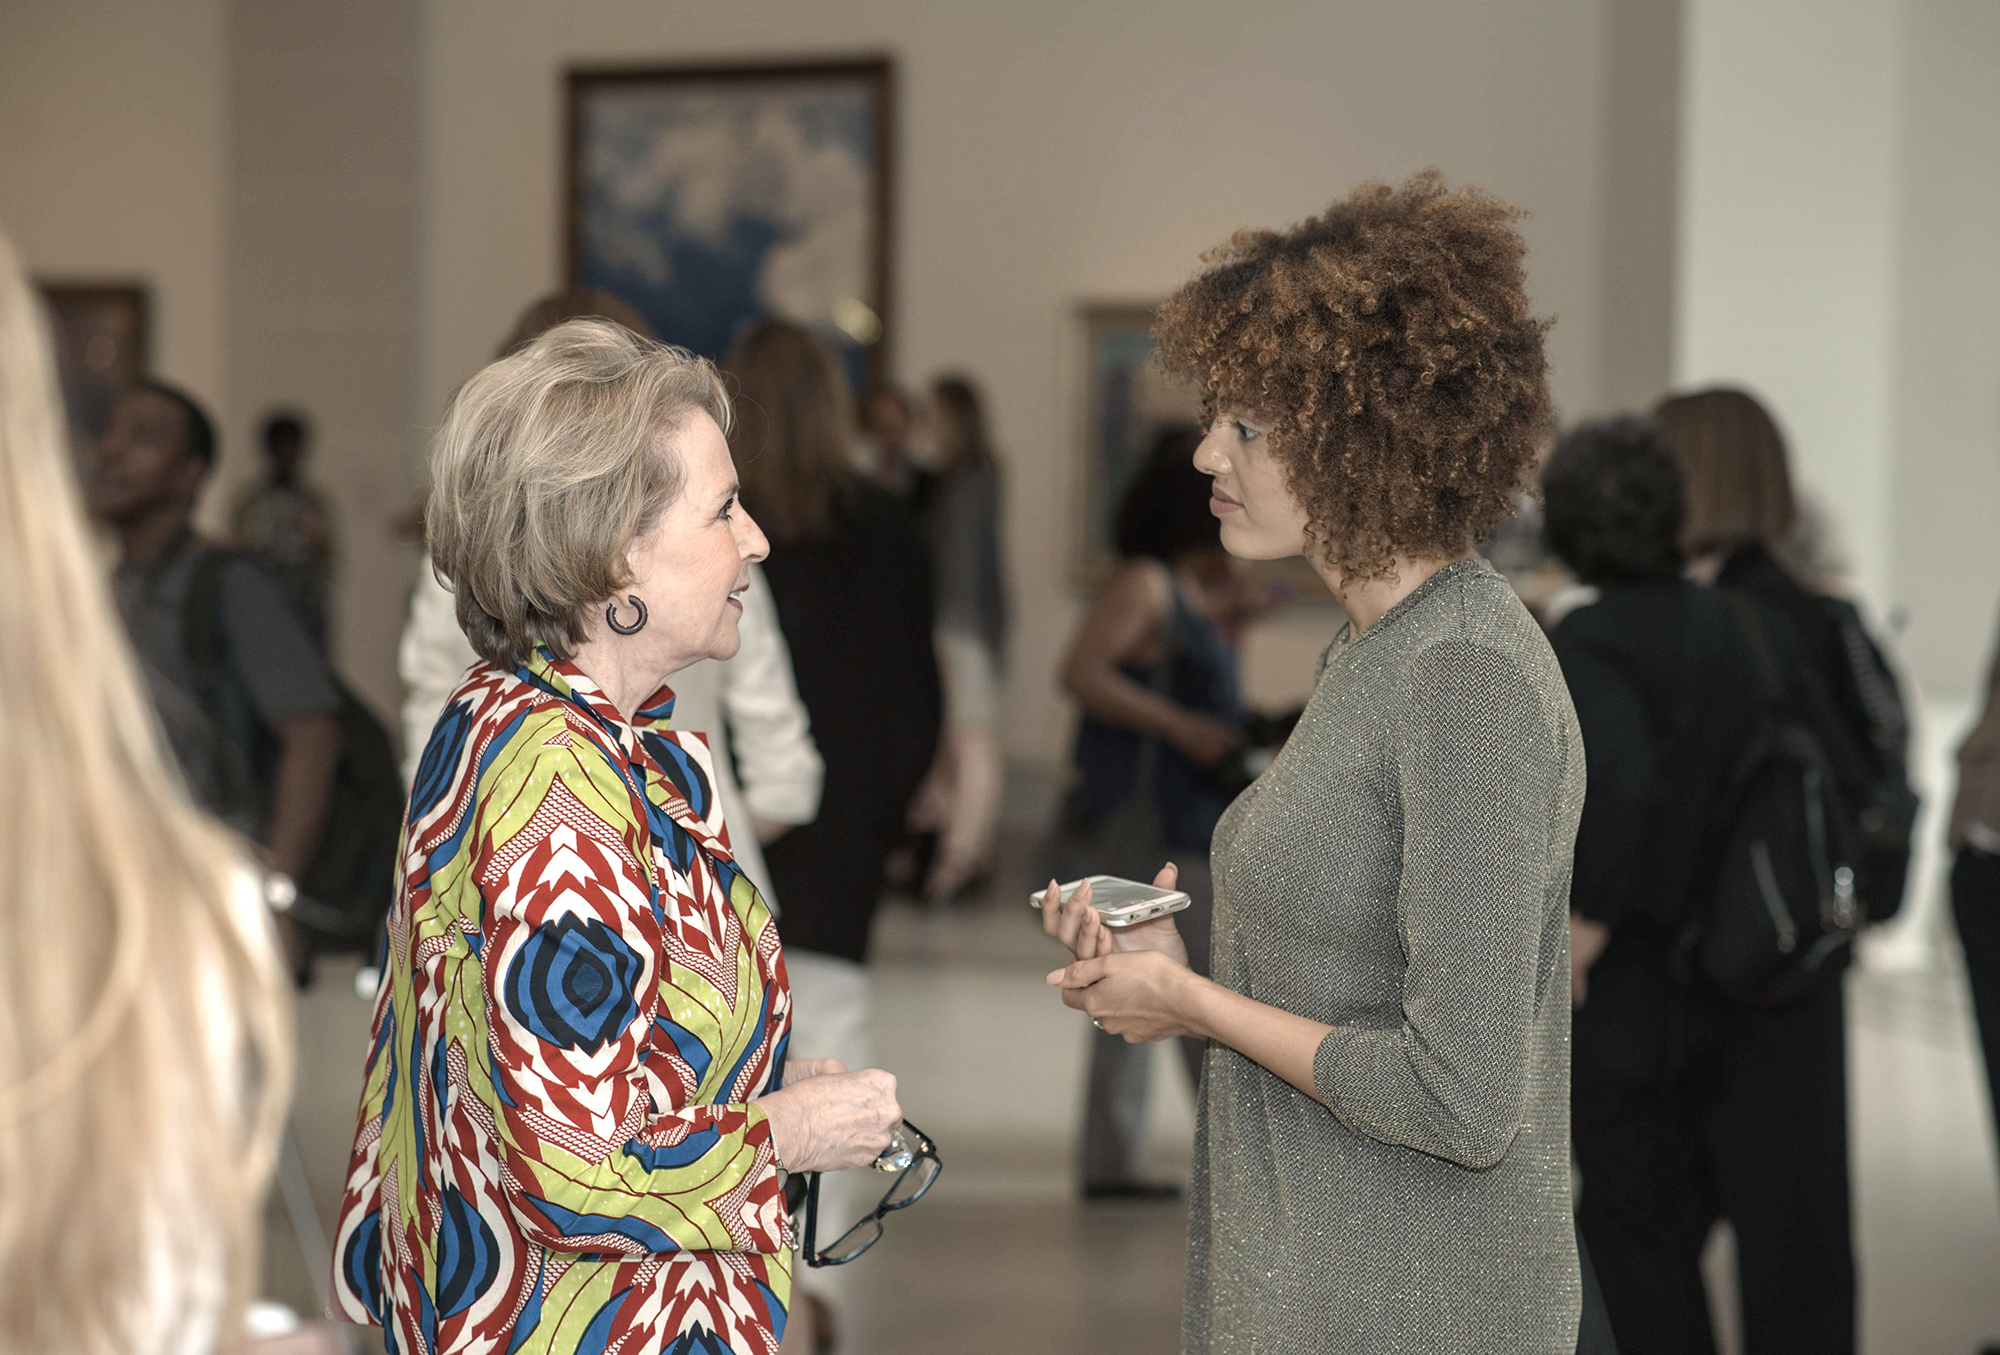 Elizabeth Sackler & Guest;  Photograph ©Malcolm D. Anderson